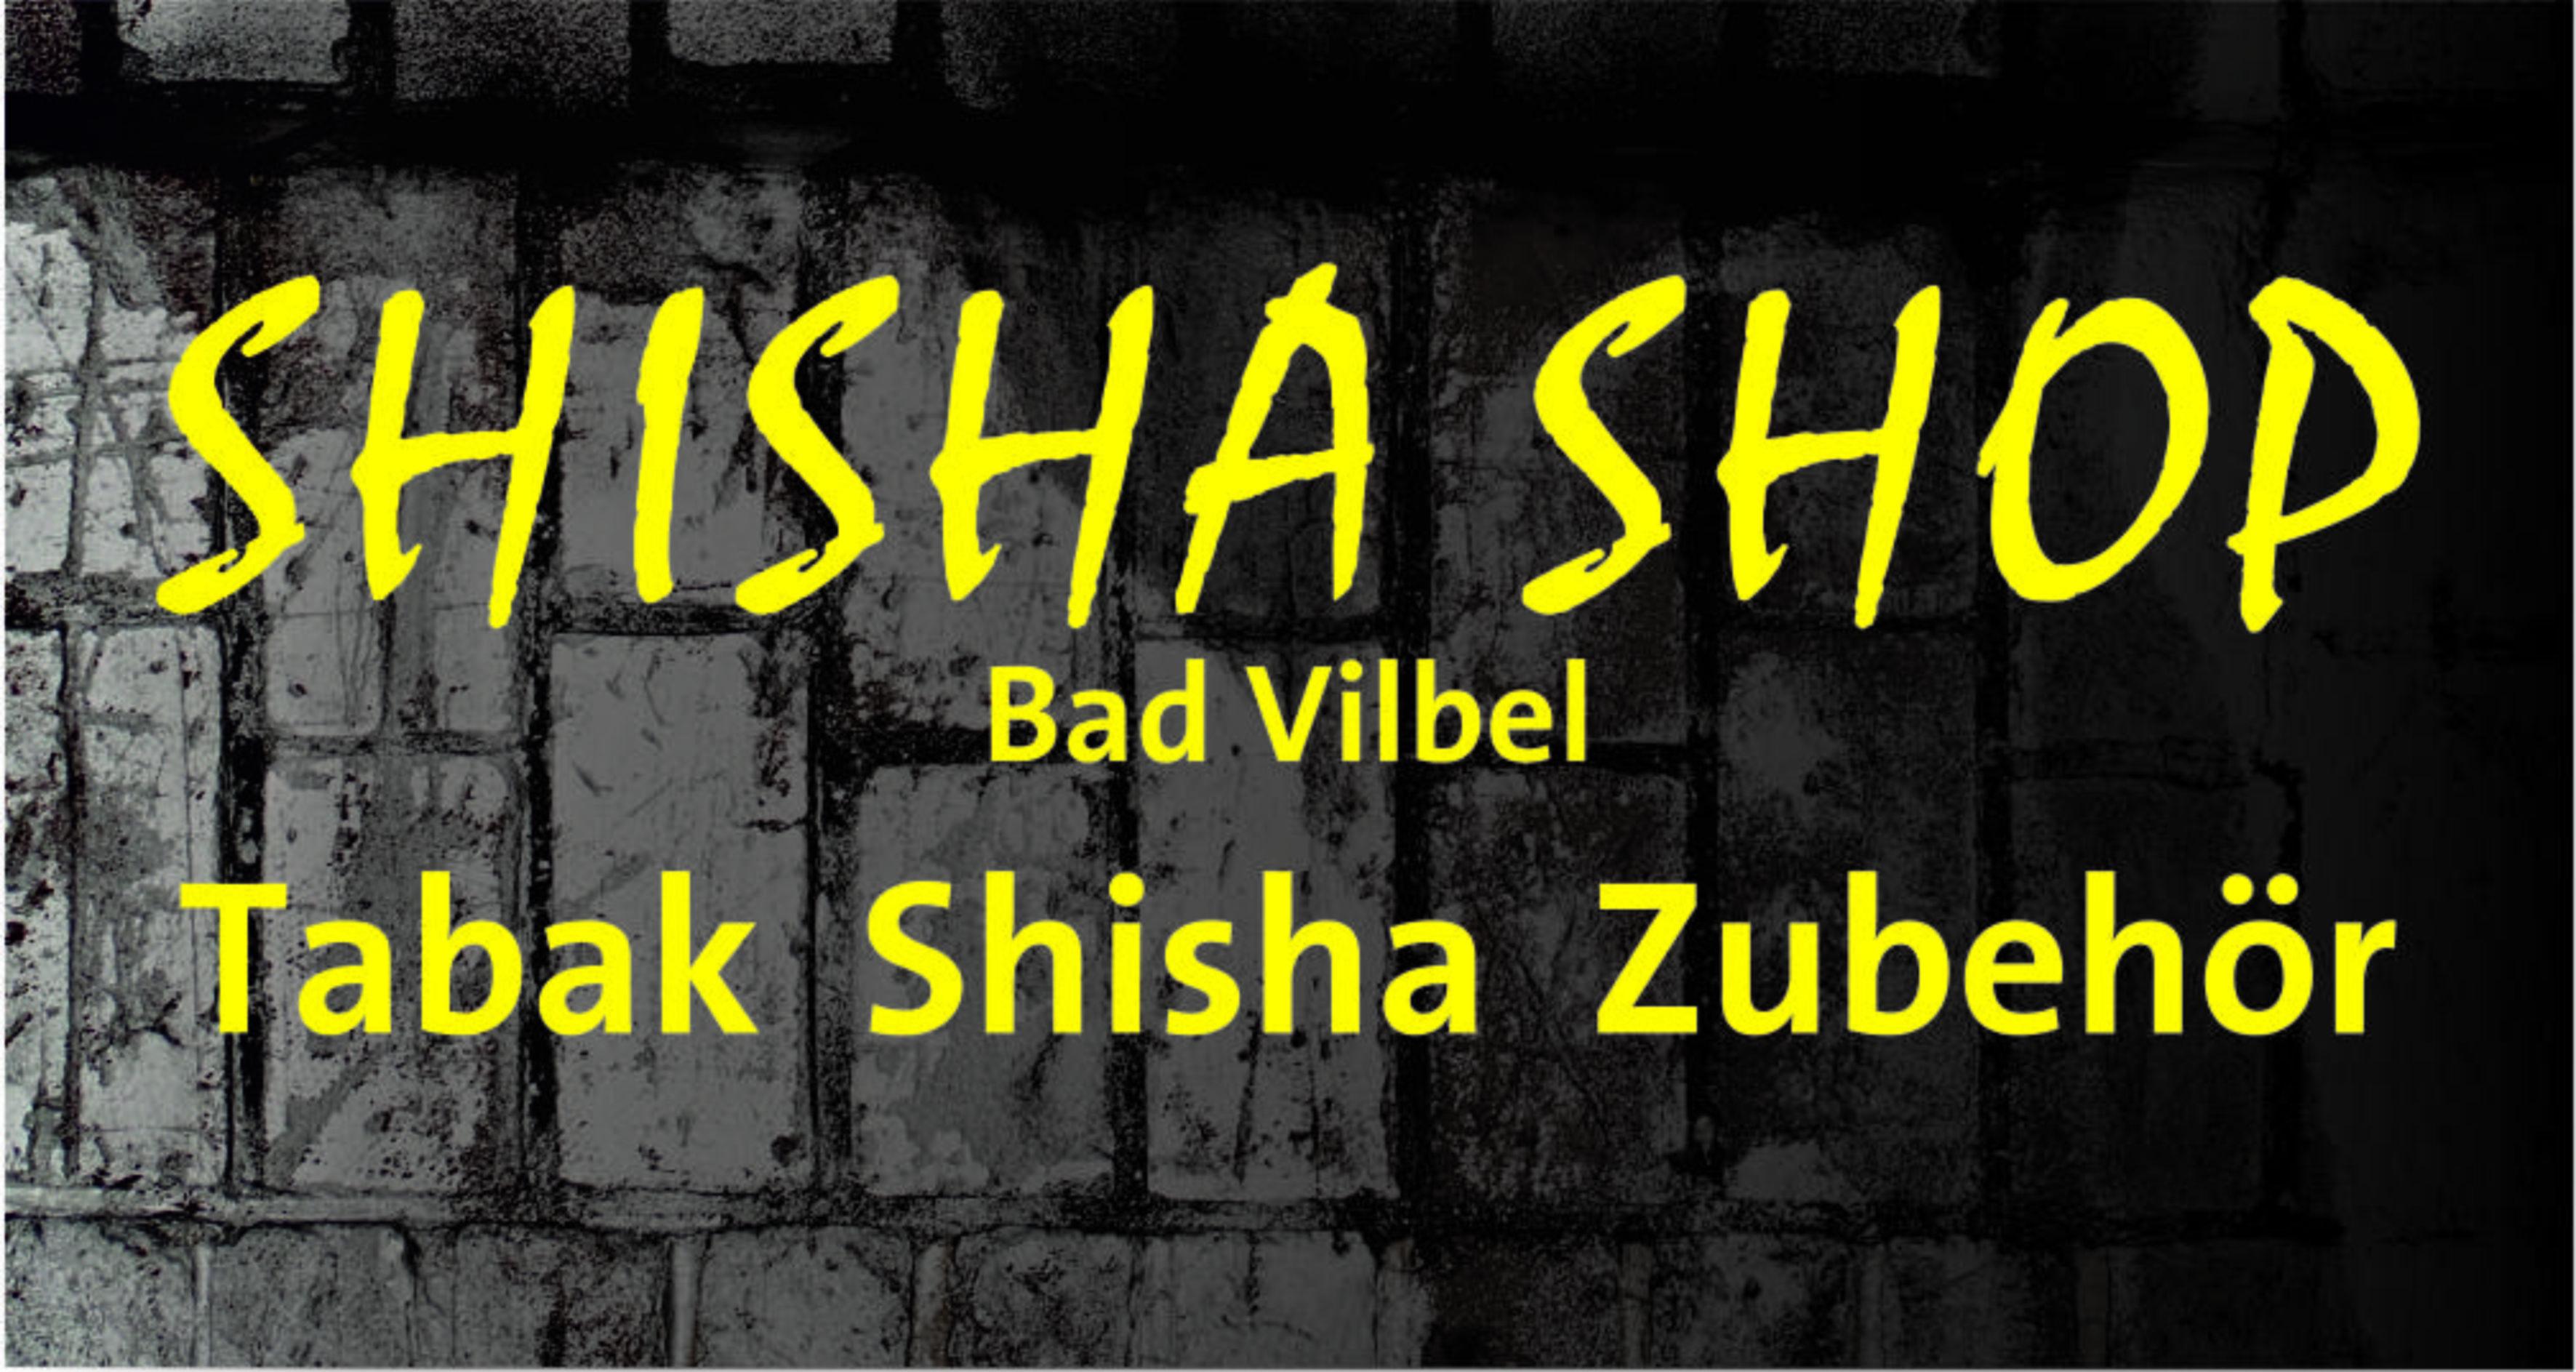 Shisha Shop Bad Vilbel